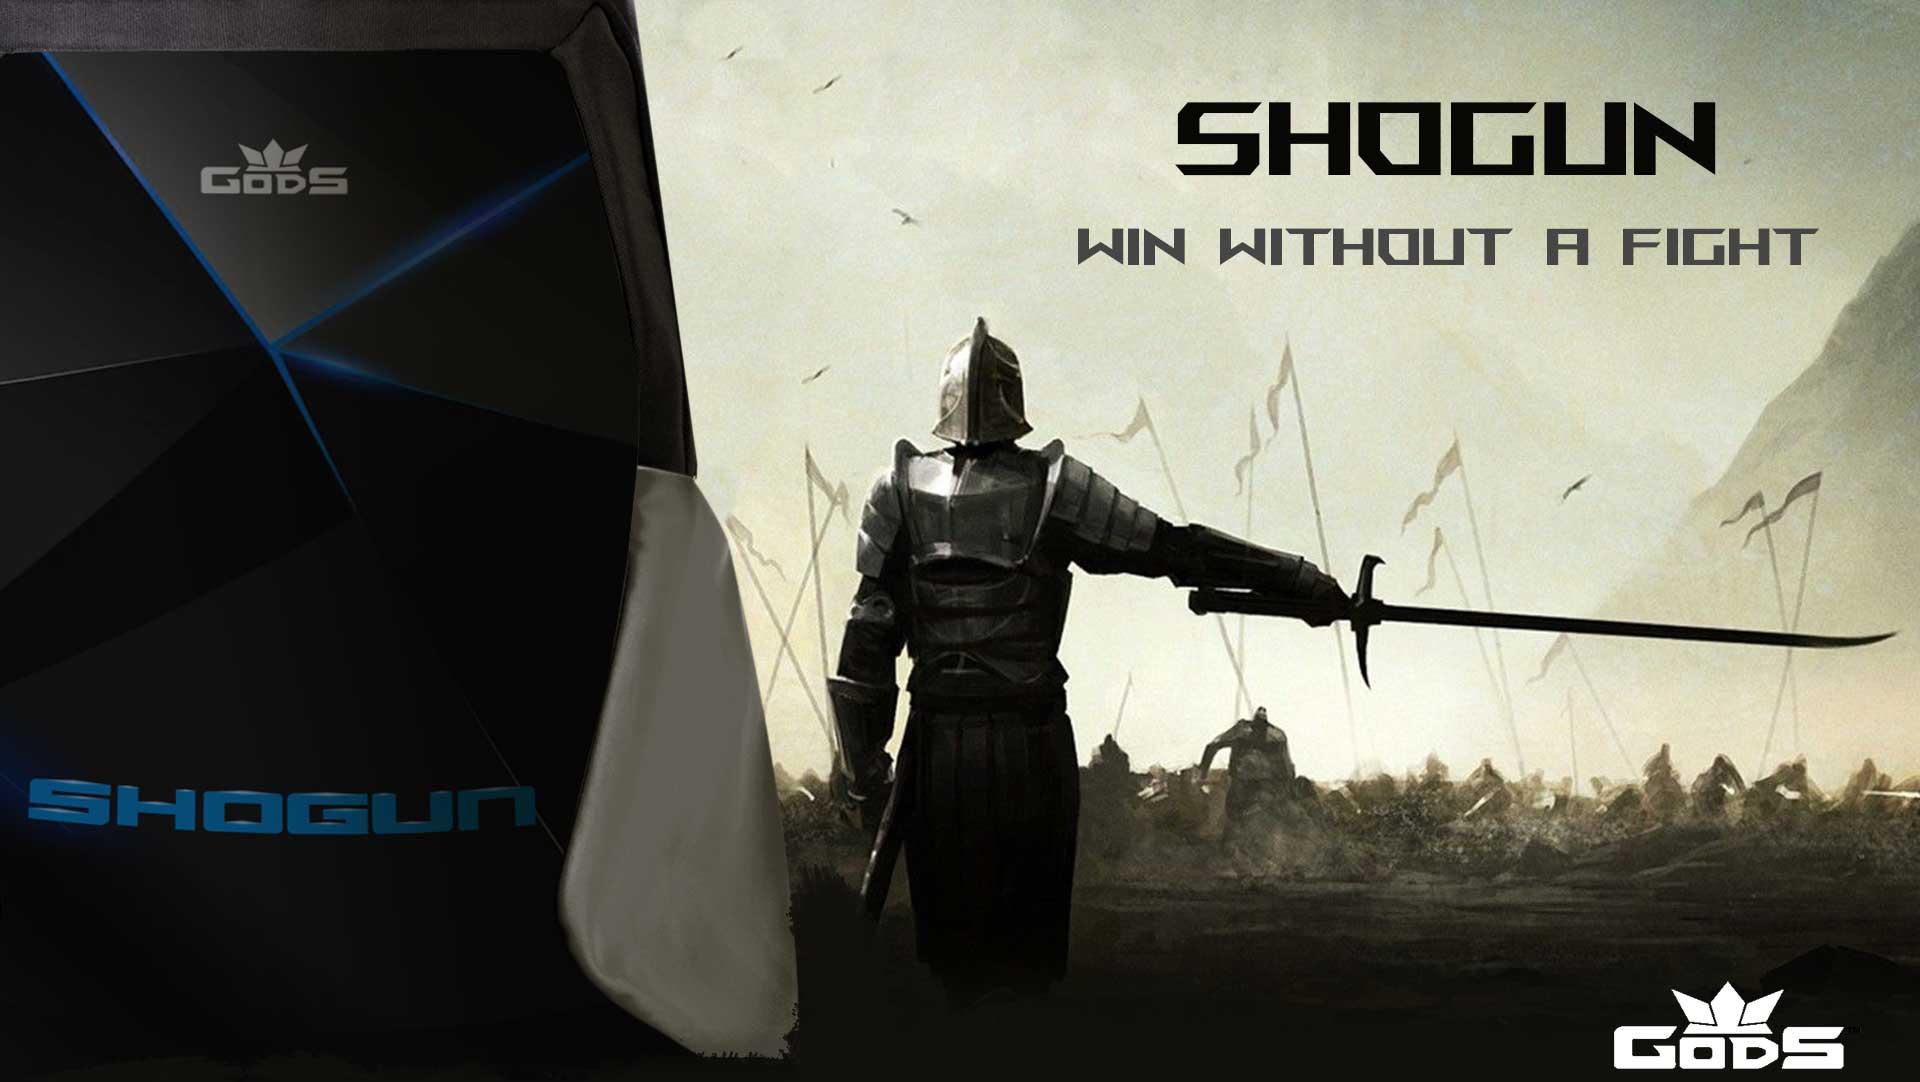 Shogun Launch image